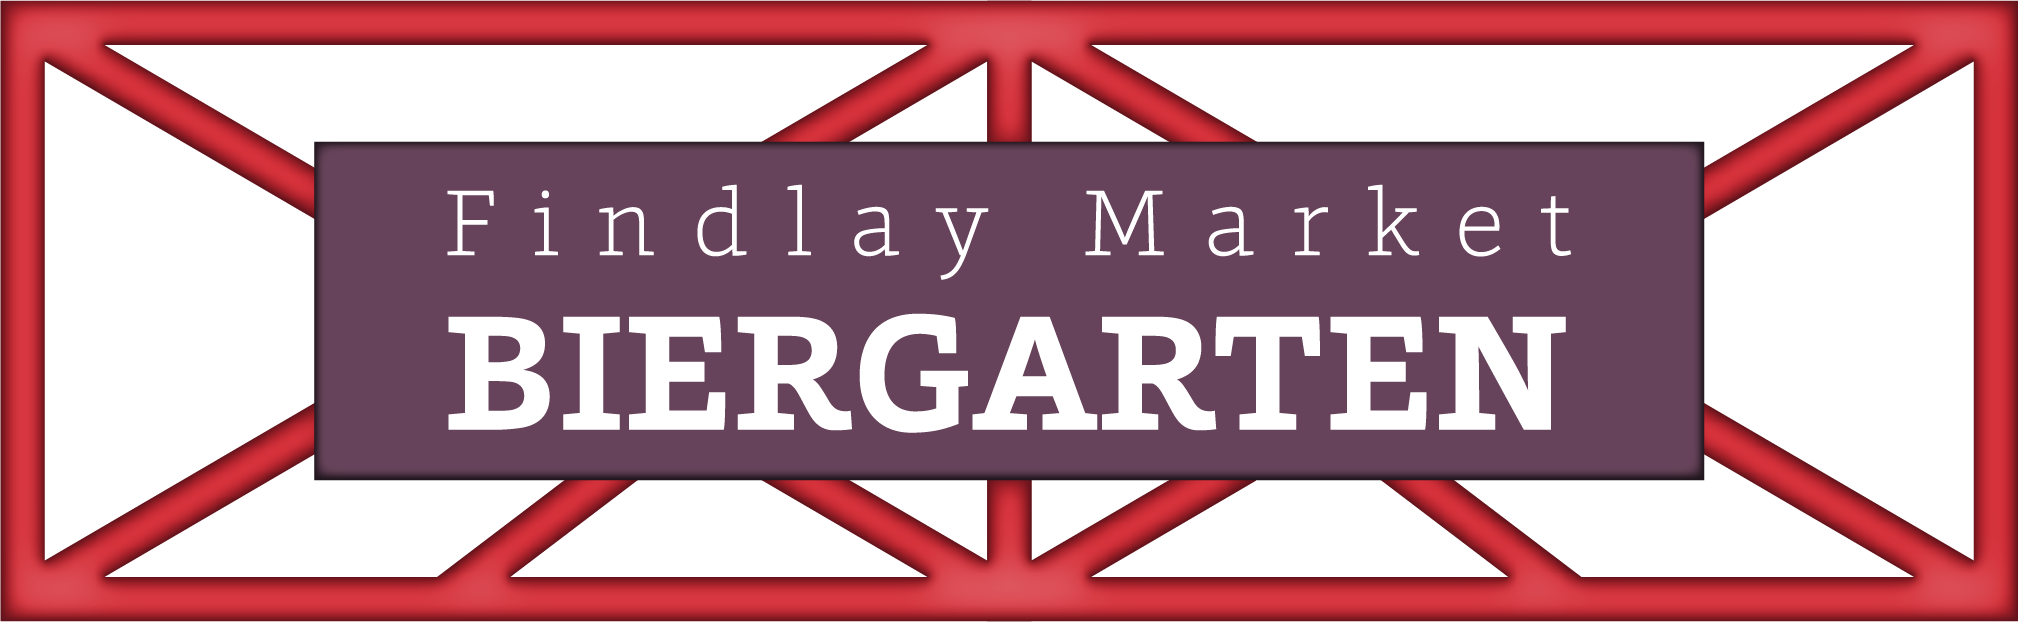 Final_Biergarten_Logo-01.png